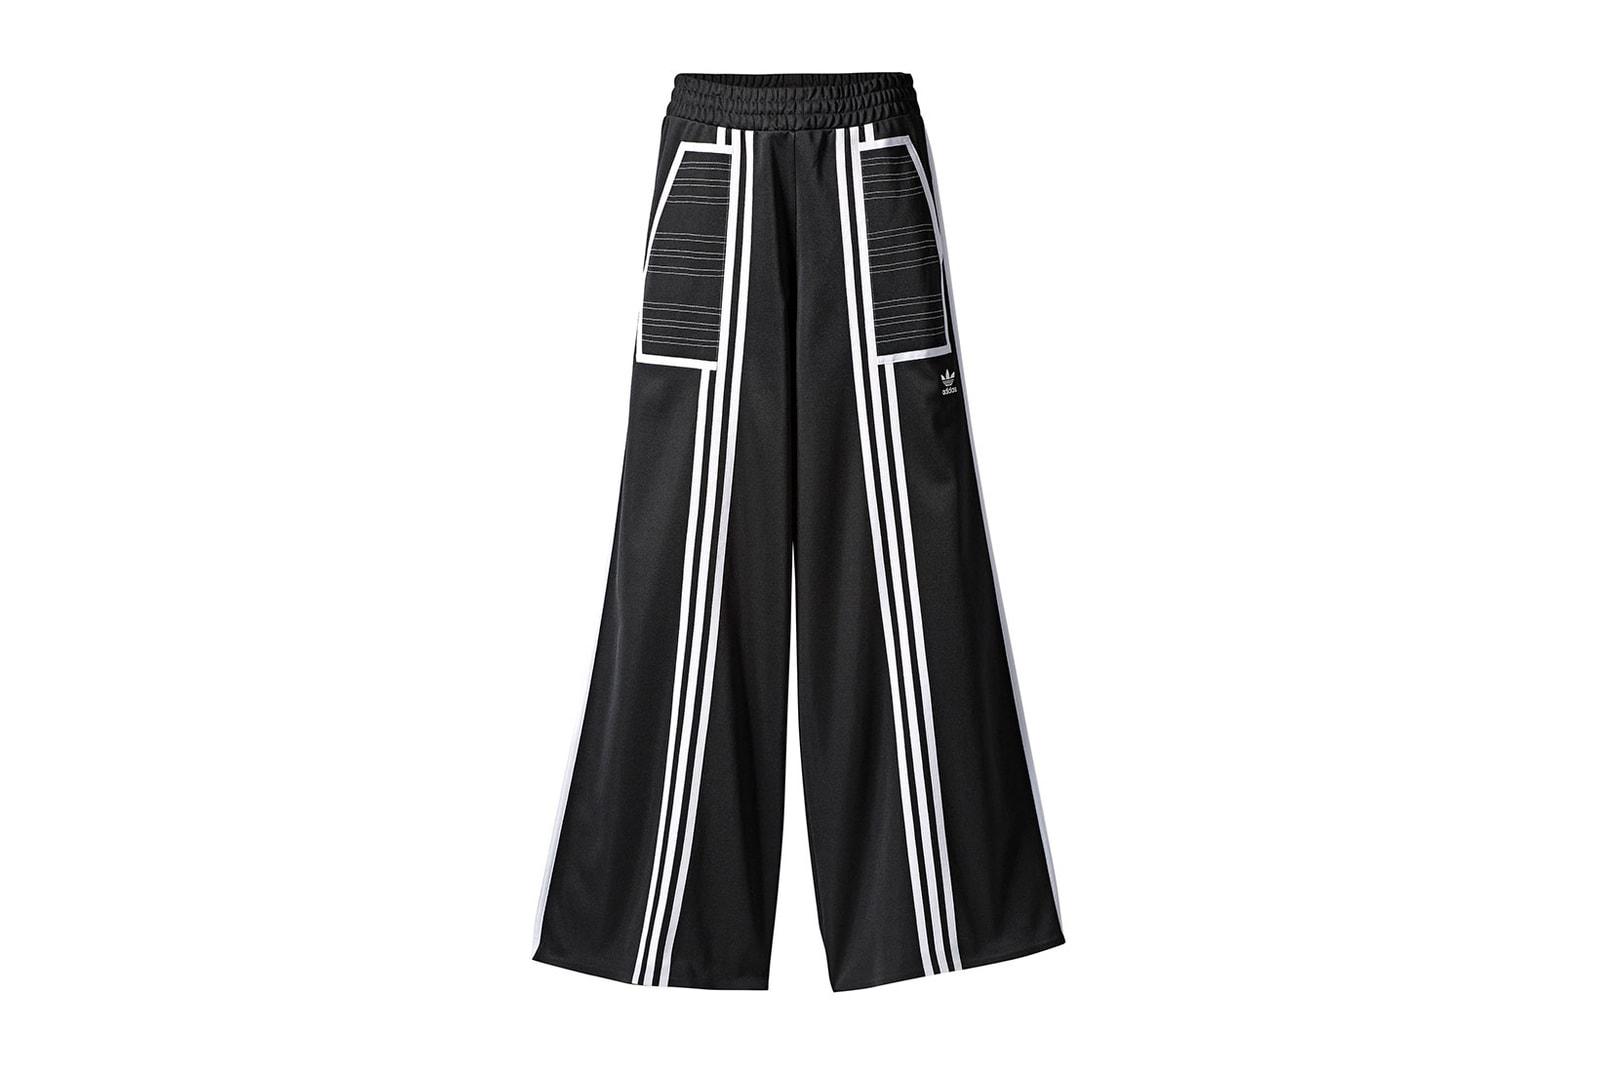 adidas originals ji won choi collab drop release tracksuit pants trousers bikini swimsuit interview designer korea